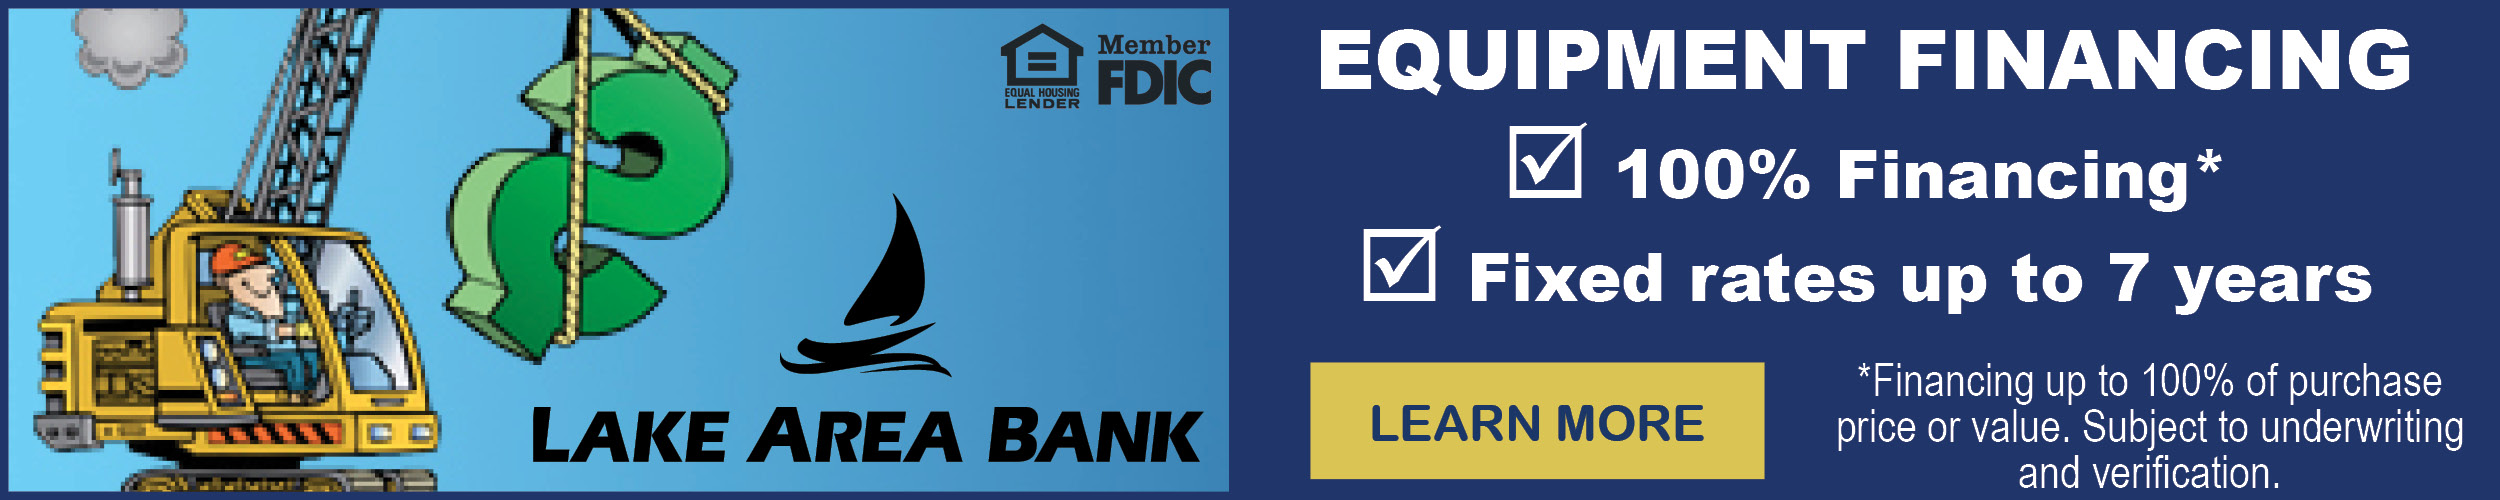 Lake Area Bank_EquipmentFinance_600x120